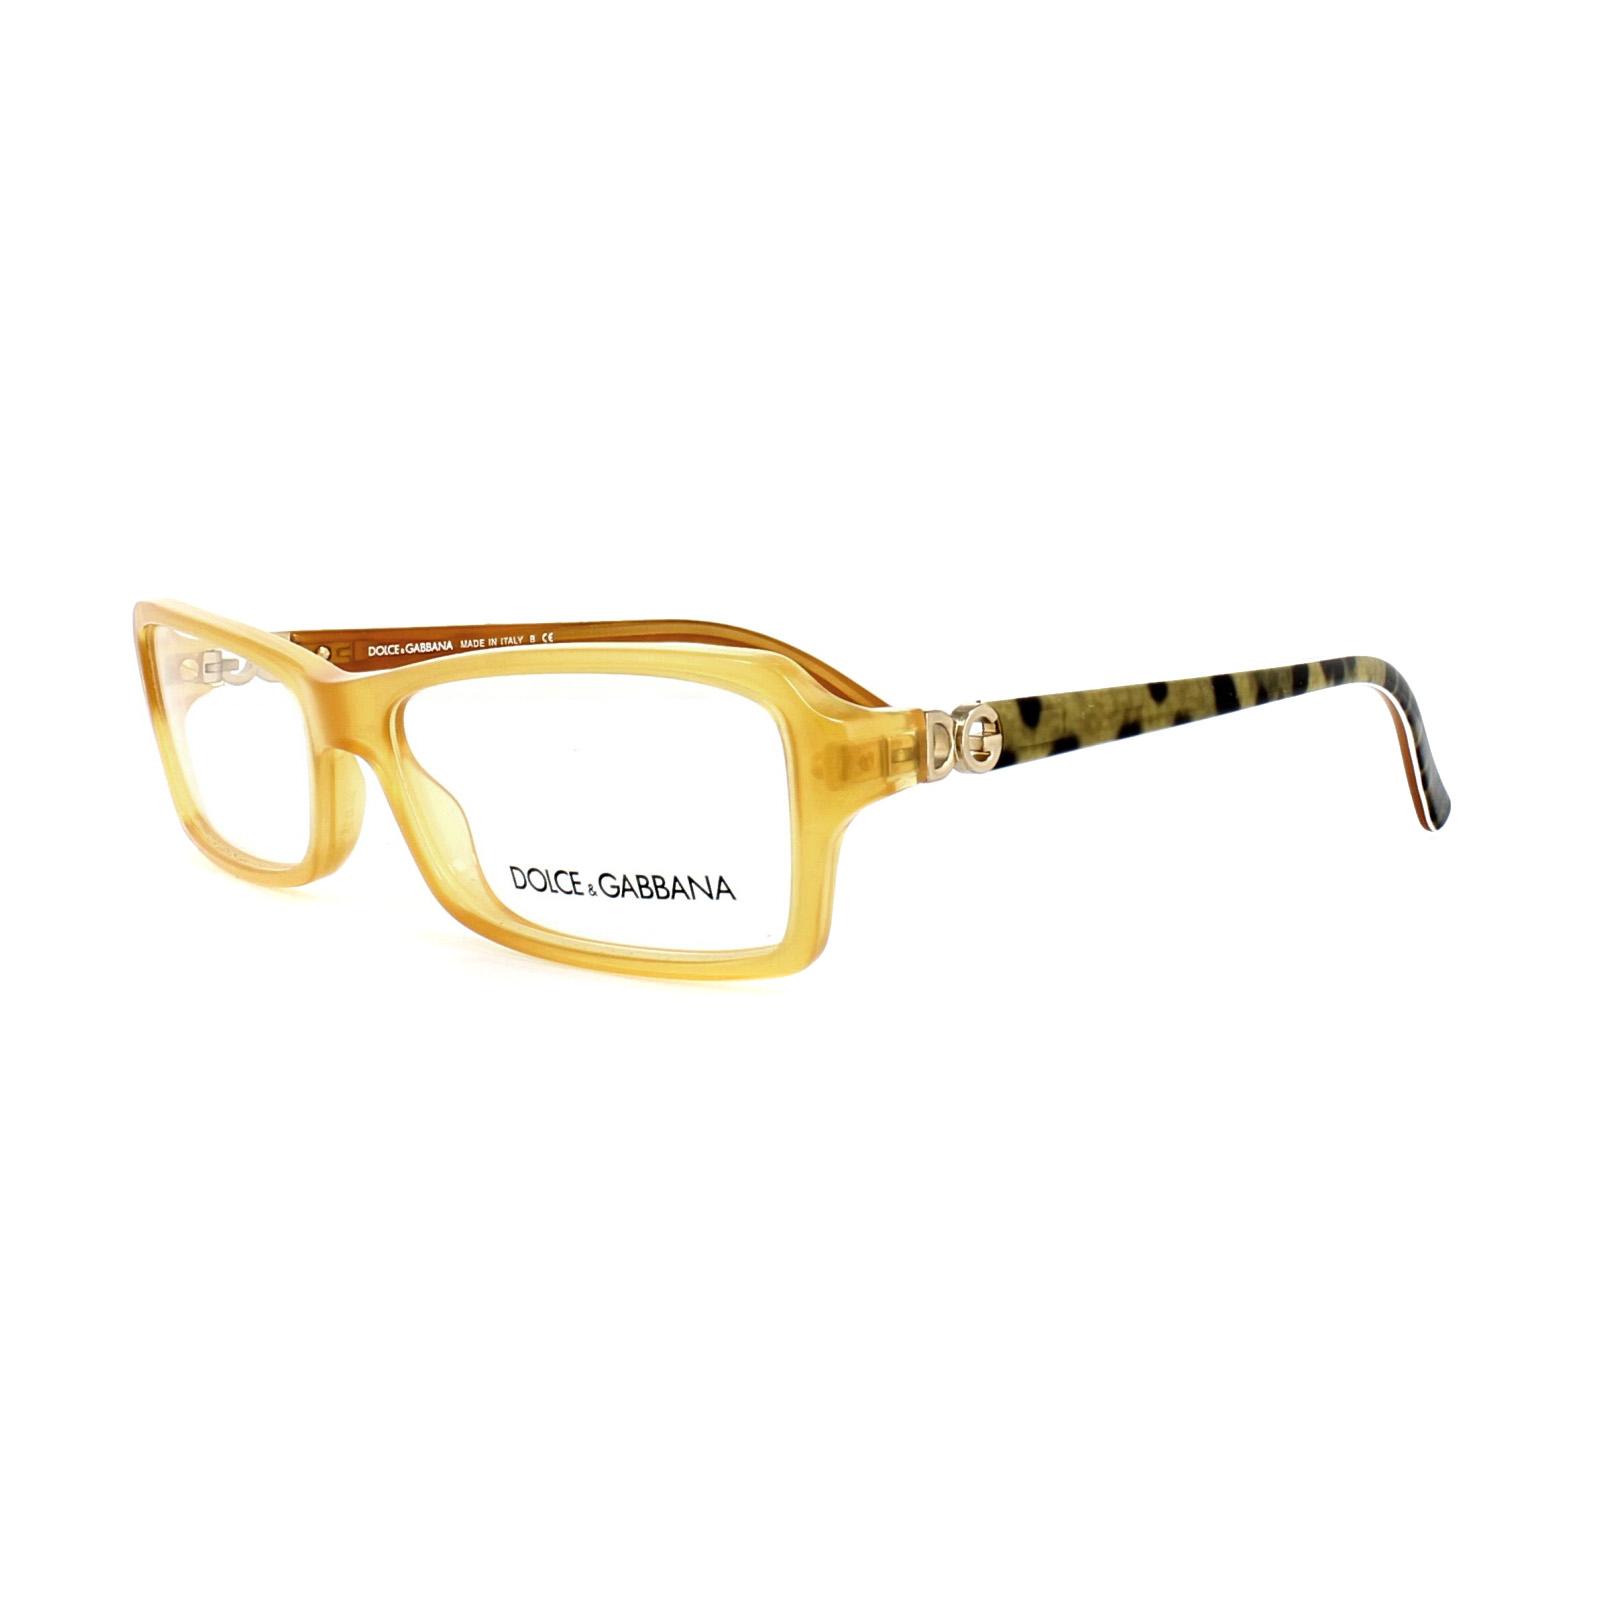 d1ab4de23189 Sentinel Dolce and Gabbana Glasses Frames DG 3101 1833 Yellow Womens 52mm